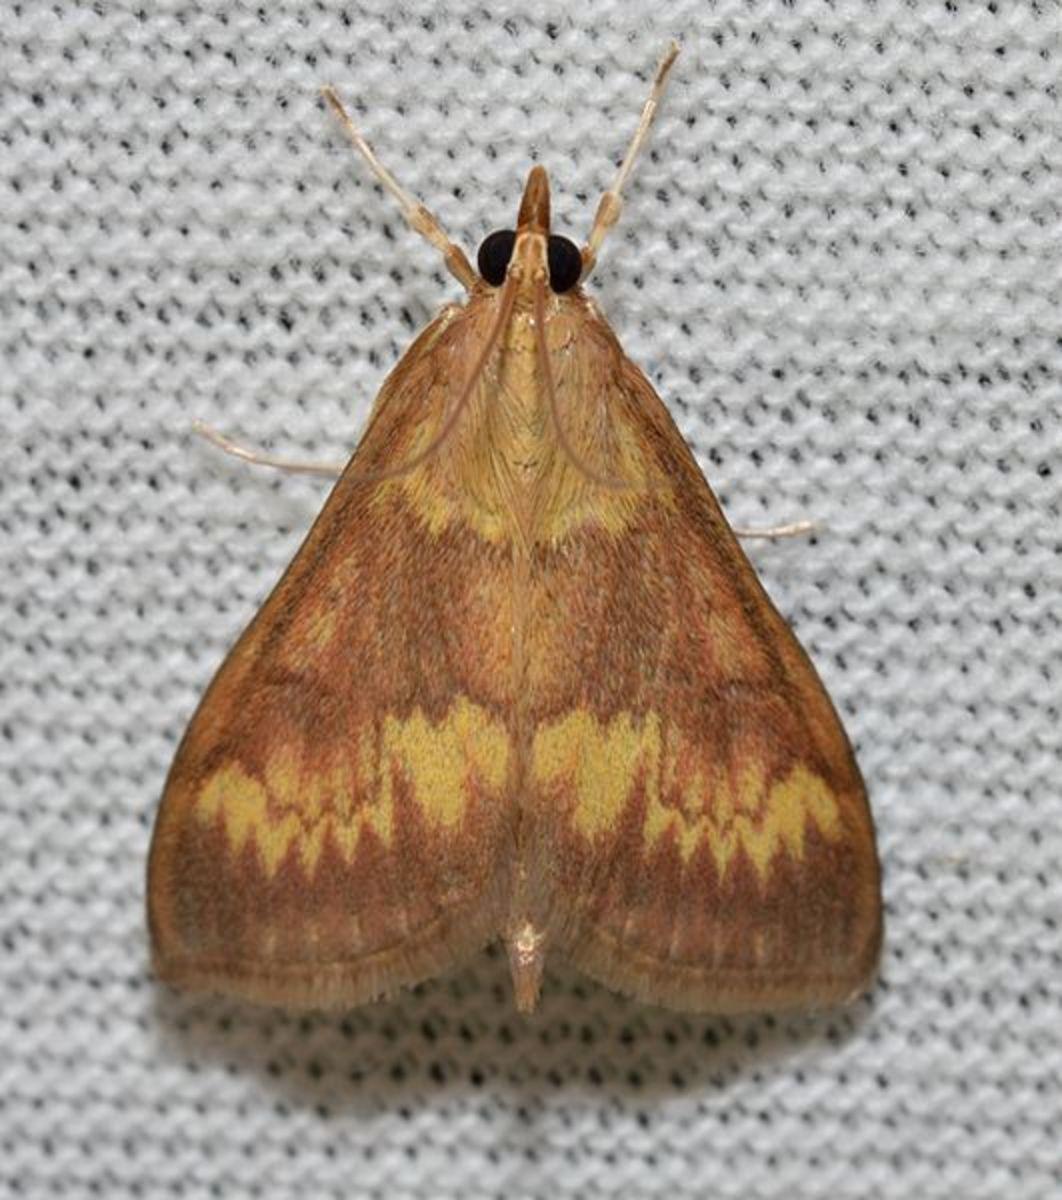 Corn borer moth.